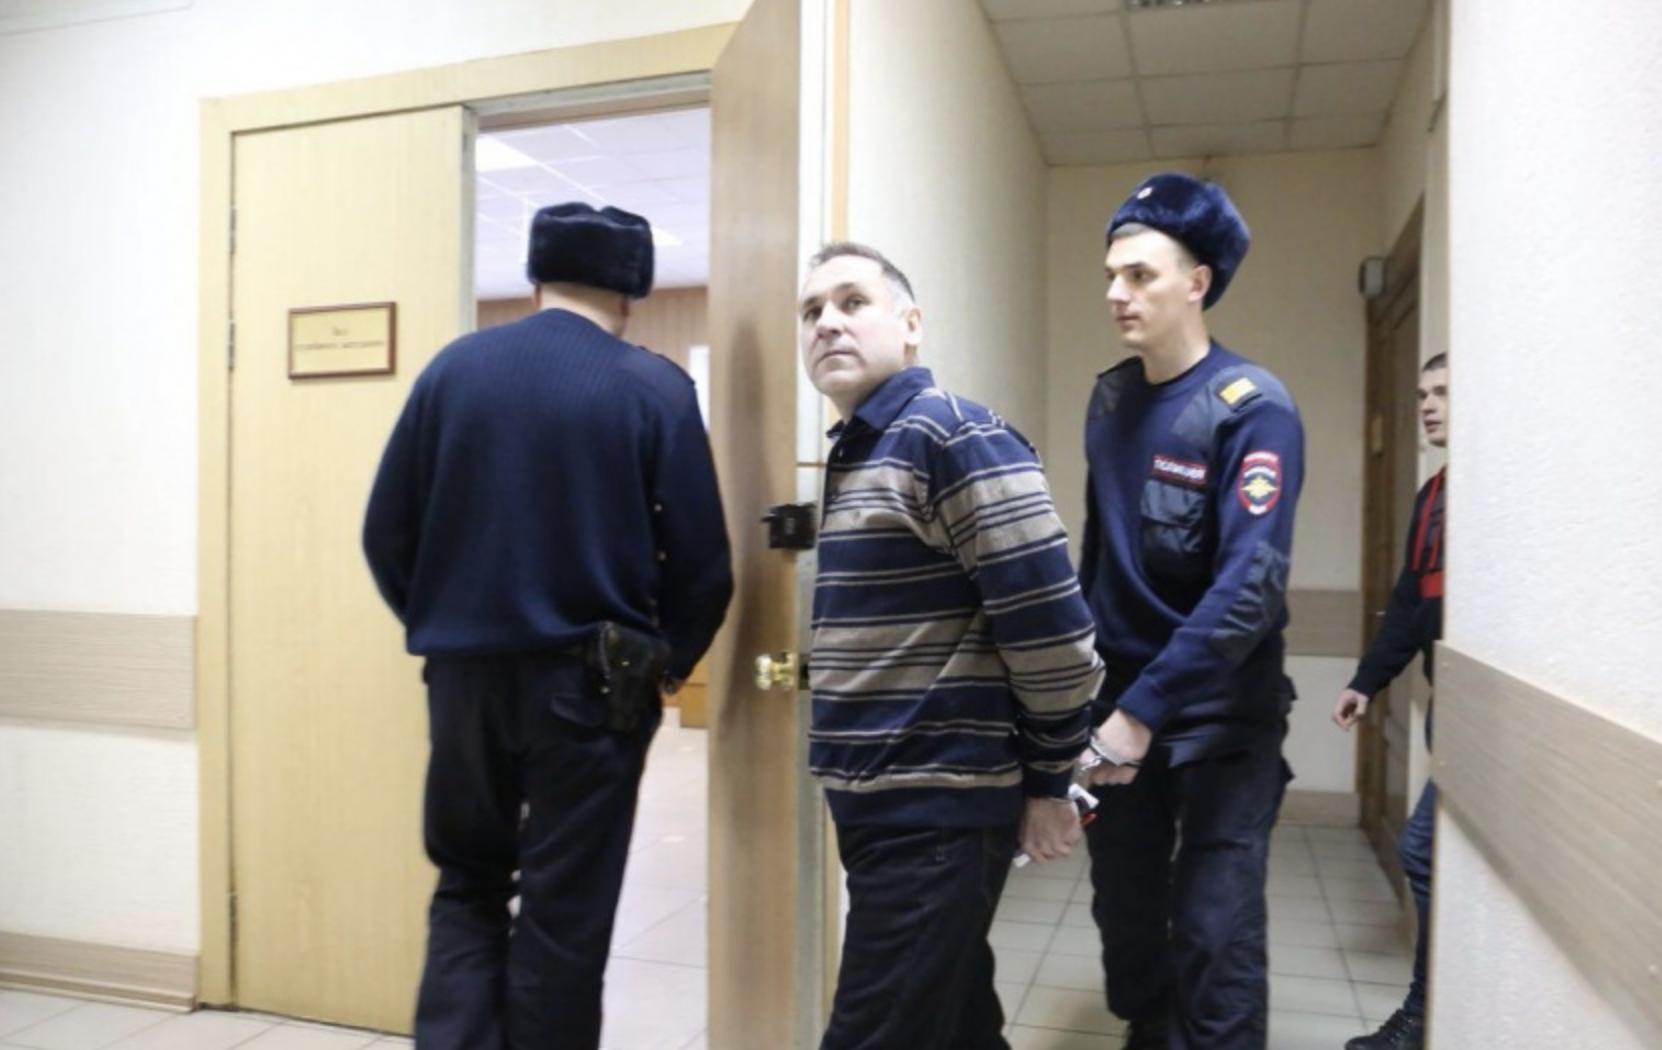 Евгения Чуплинского заводят в зал суда. Фото © НГС.Новости